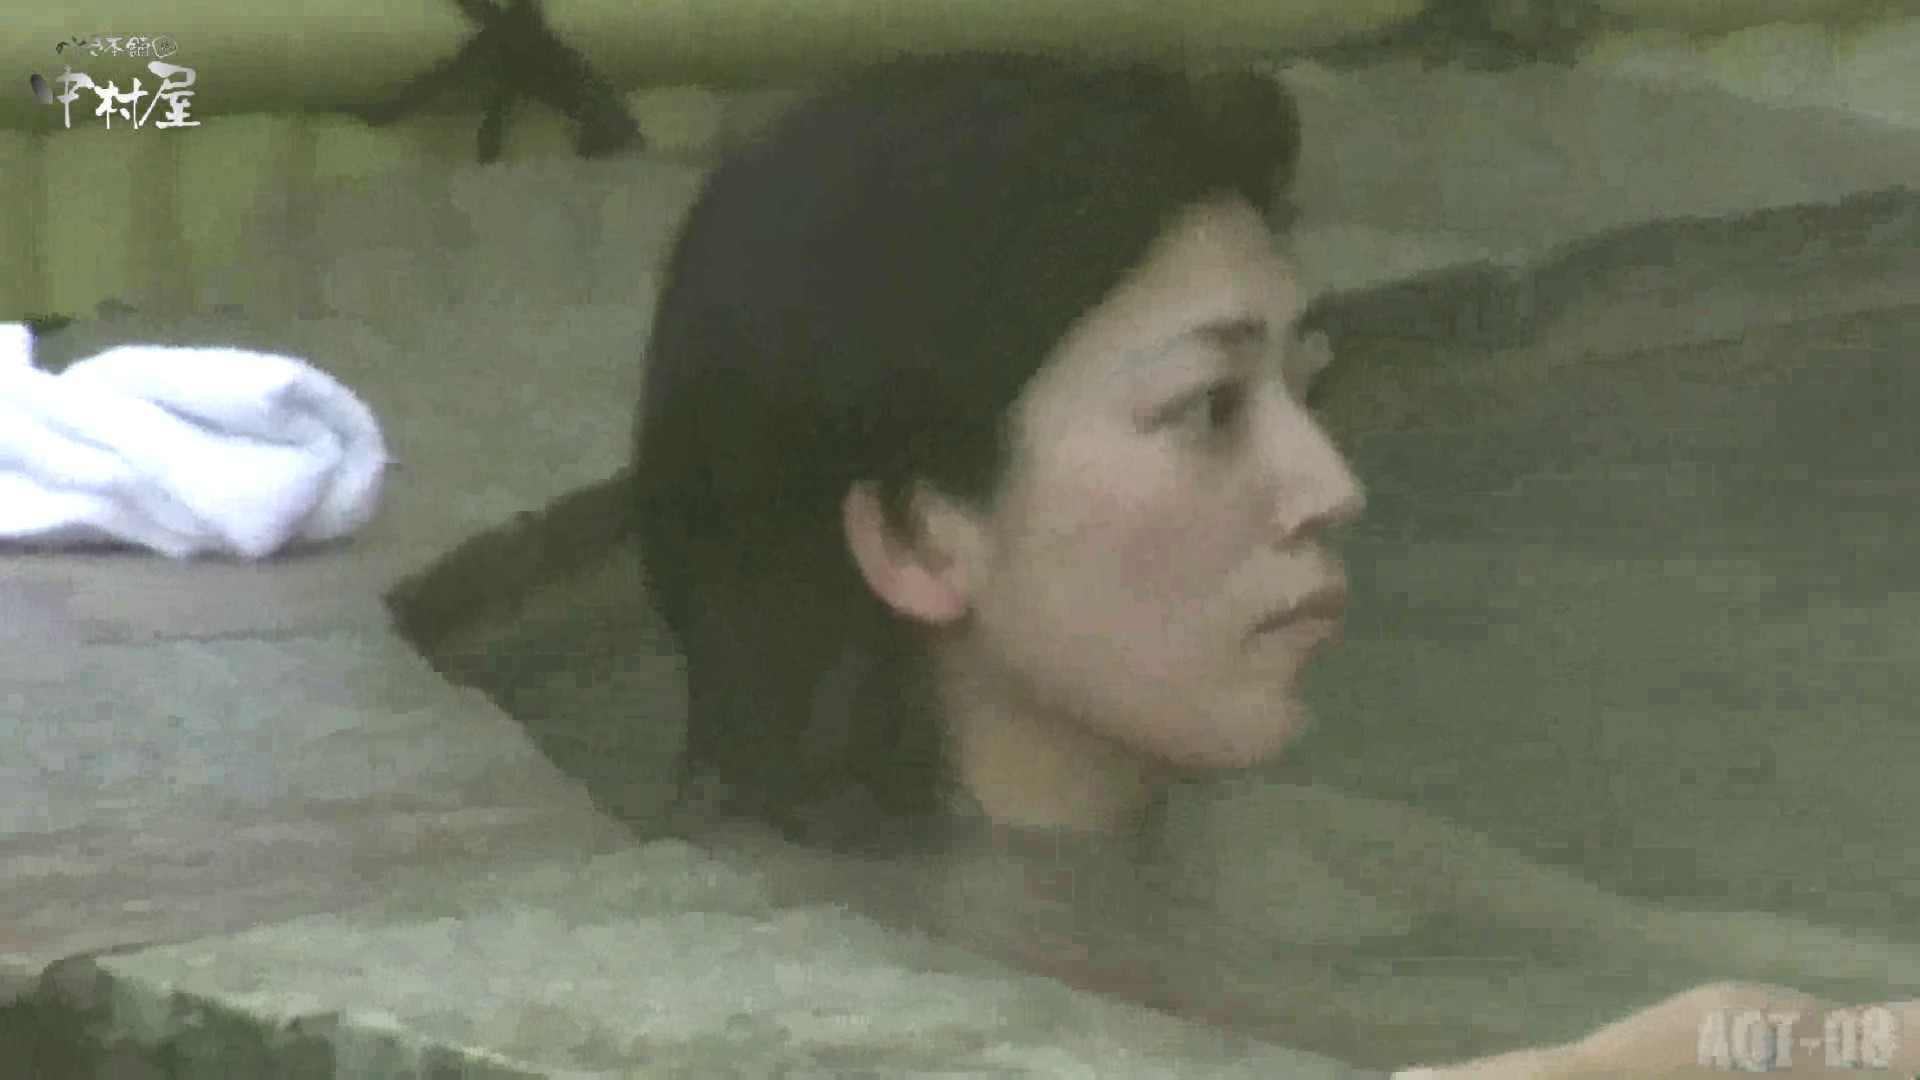 Aquaな露天風呂Vol.872潜入盗撮露天風呂八判湯 其の四 OL女体 | 女体盗撮  92連発 45